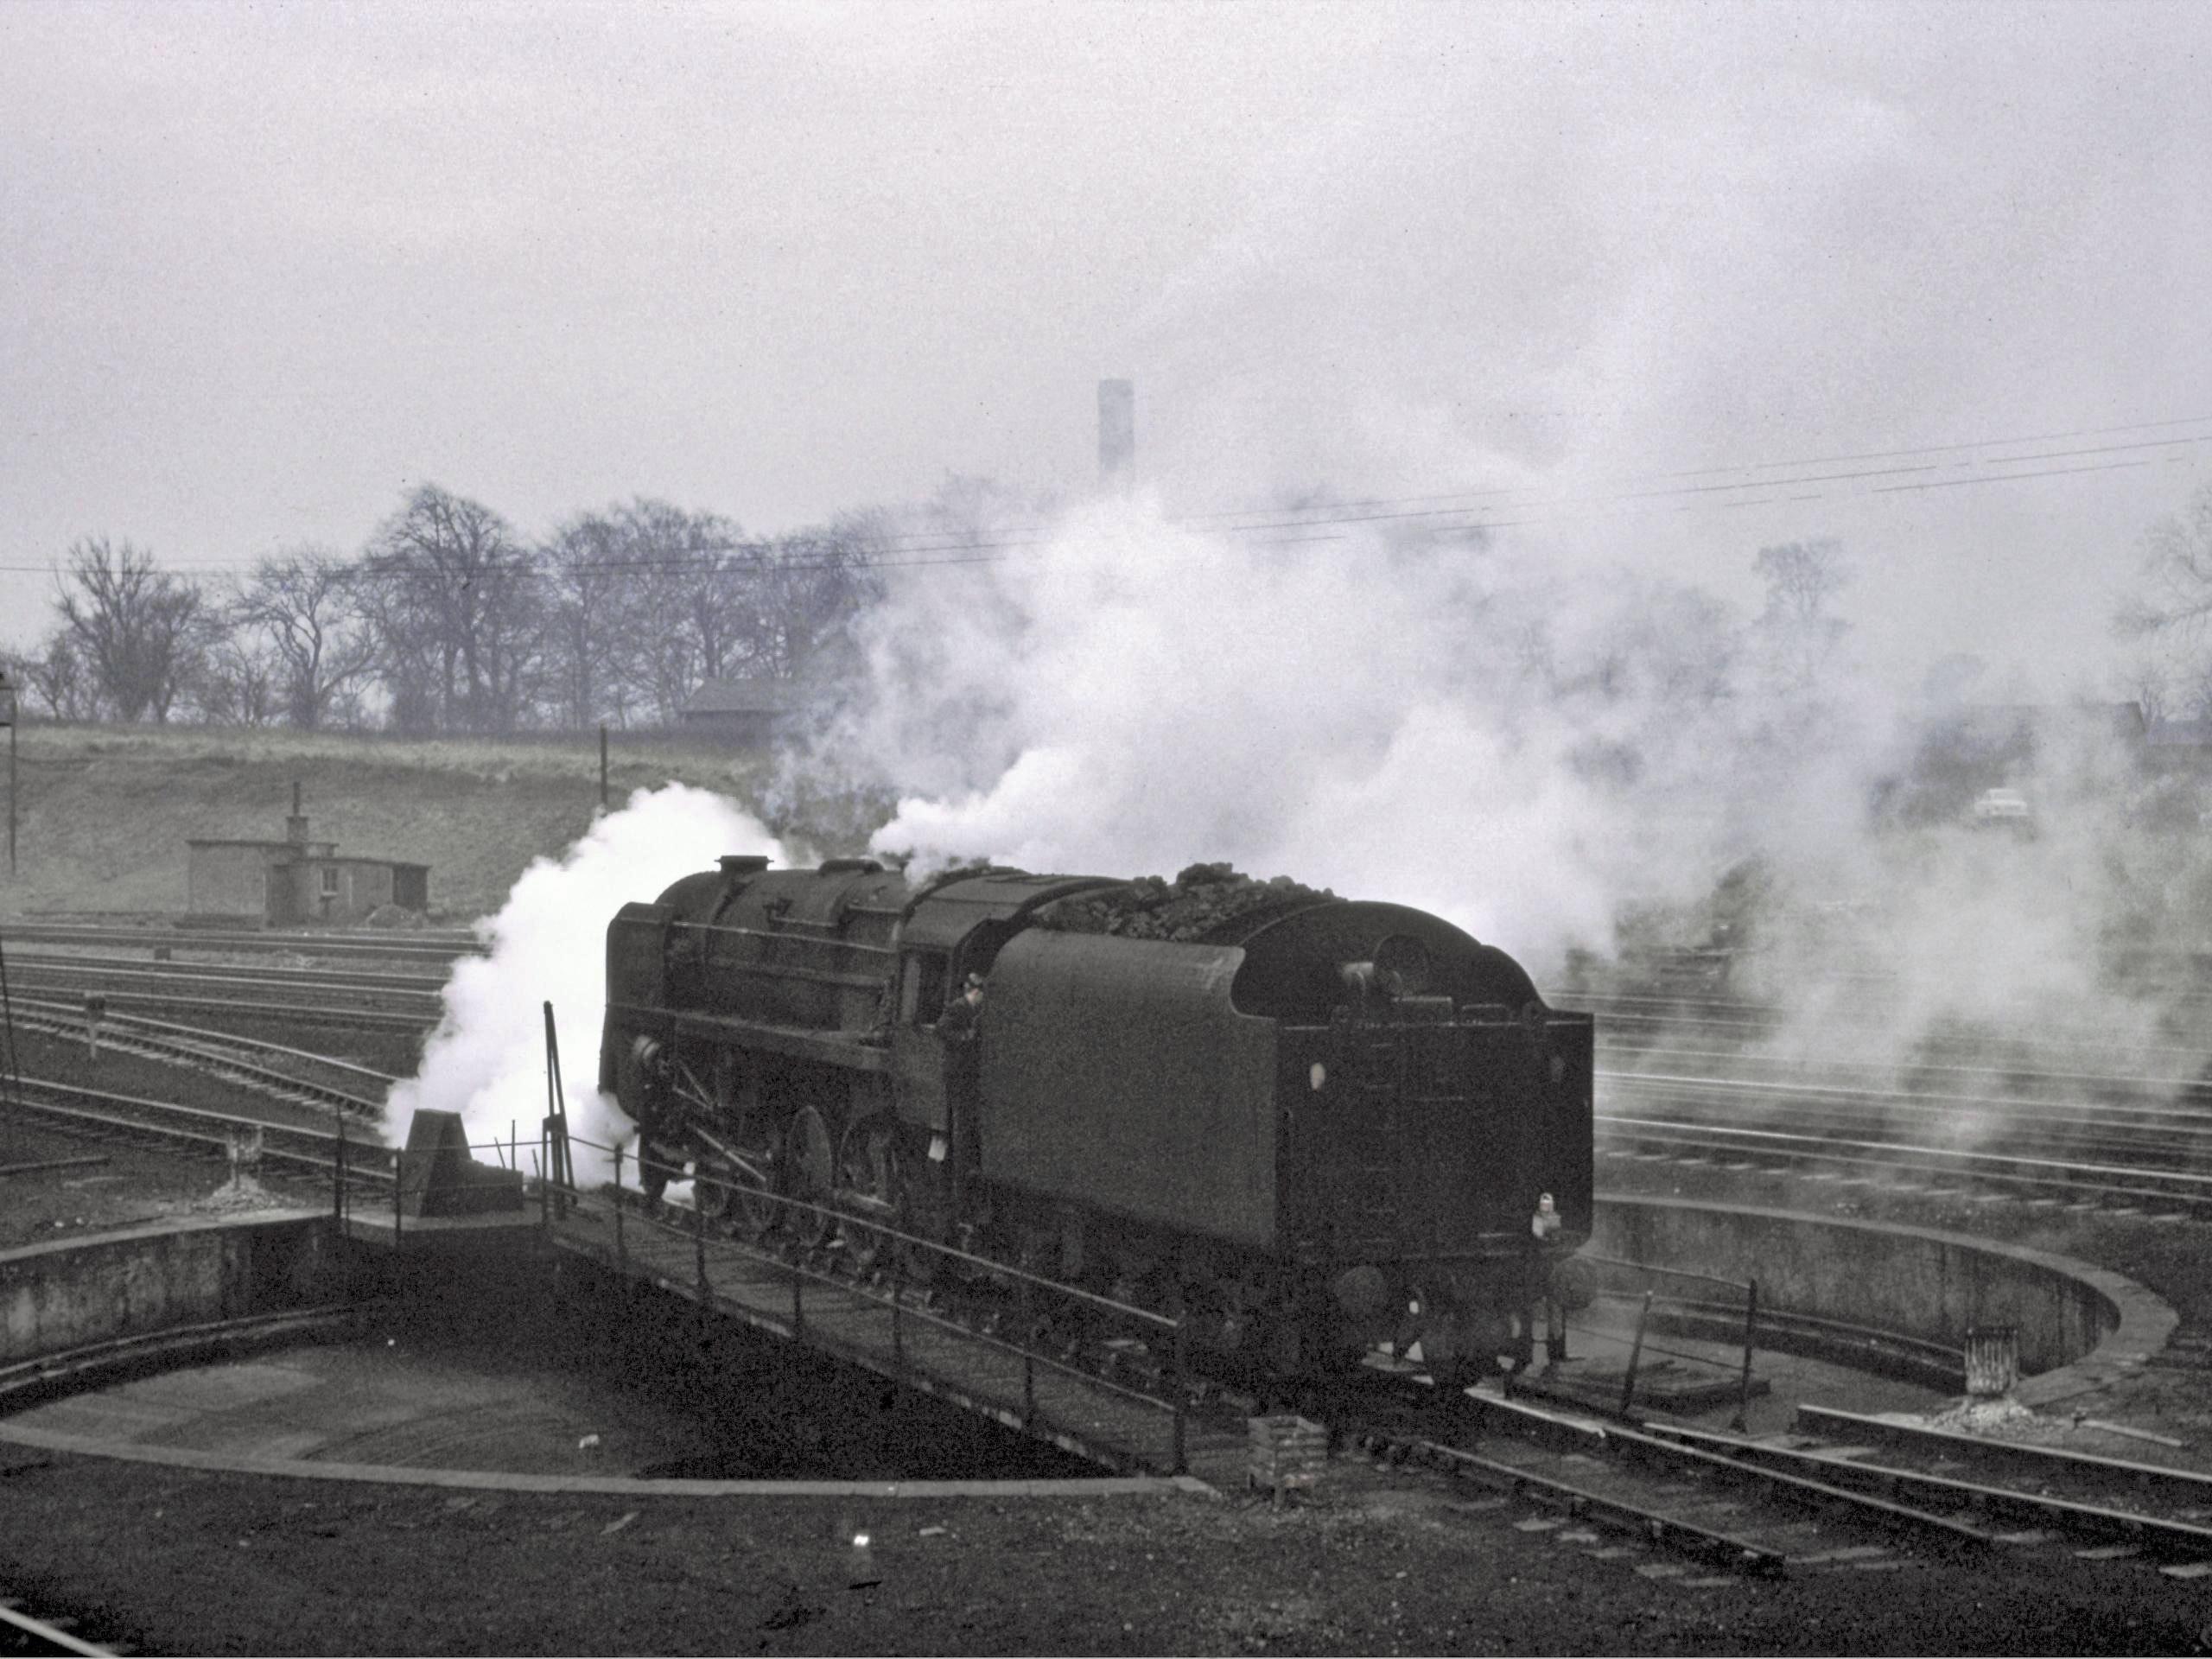 9F 92000 92250 2 10 0 BR Standard Class 9 Preserved